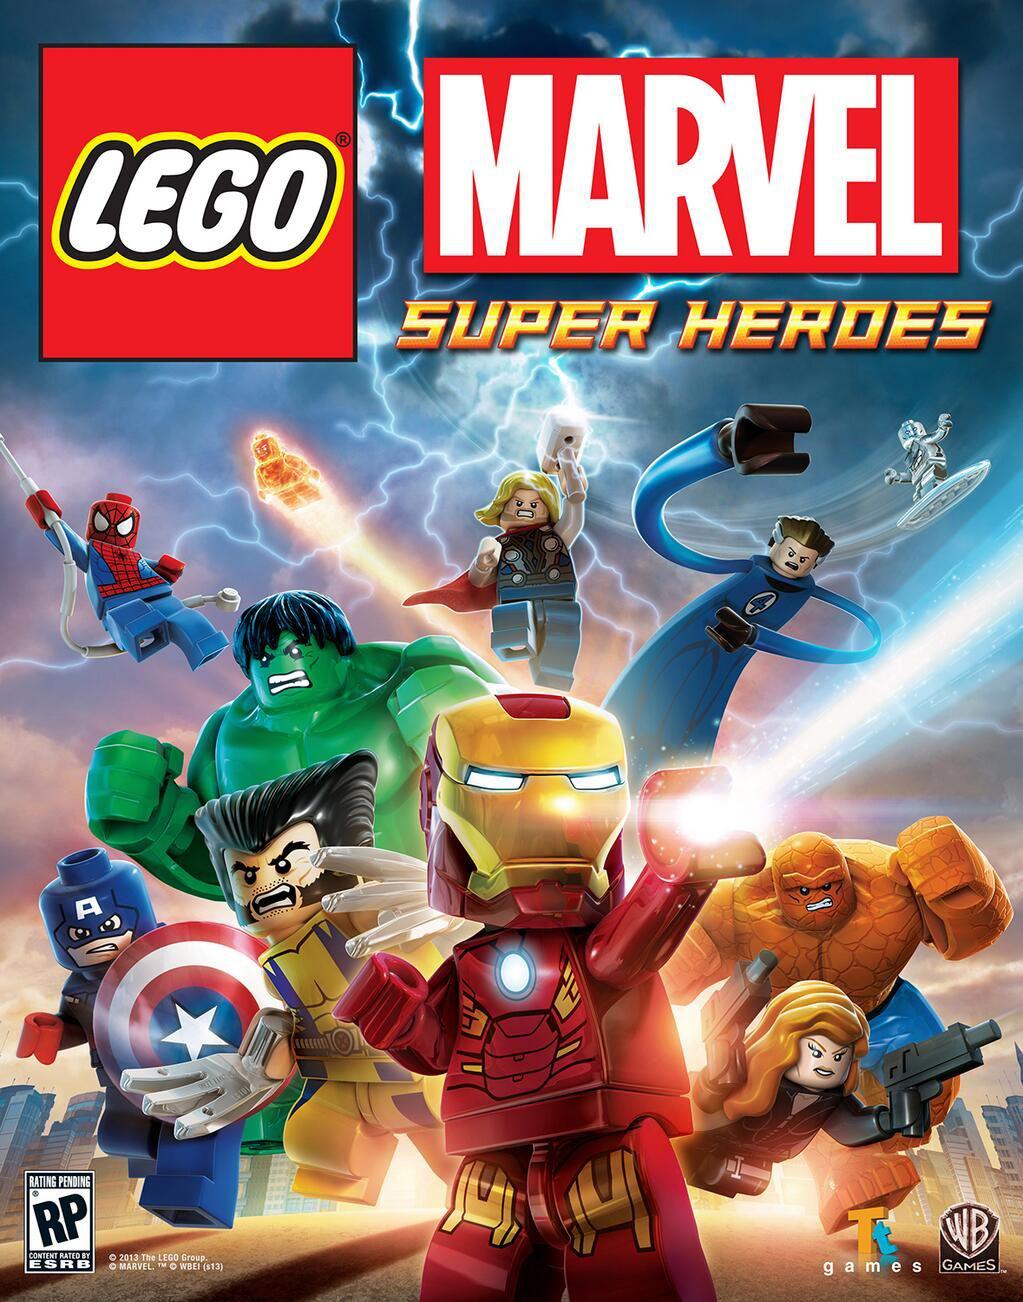 IFD Warner : Injustice Gods Among Us à 6.99€, Batman Arkham Origins Blackgate à 4.99€... Lego Marvel Super Heroes